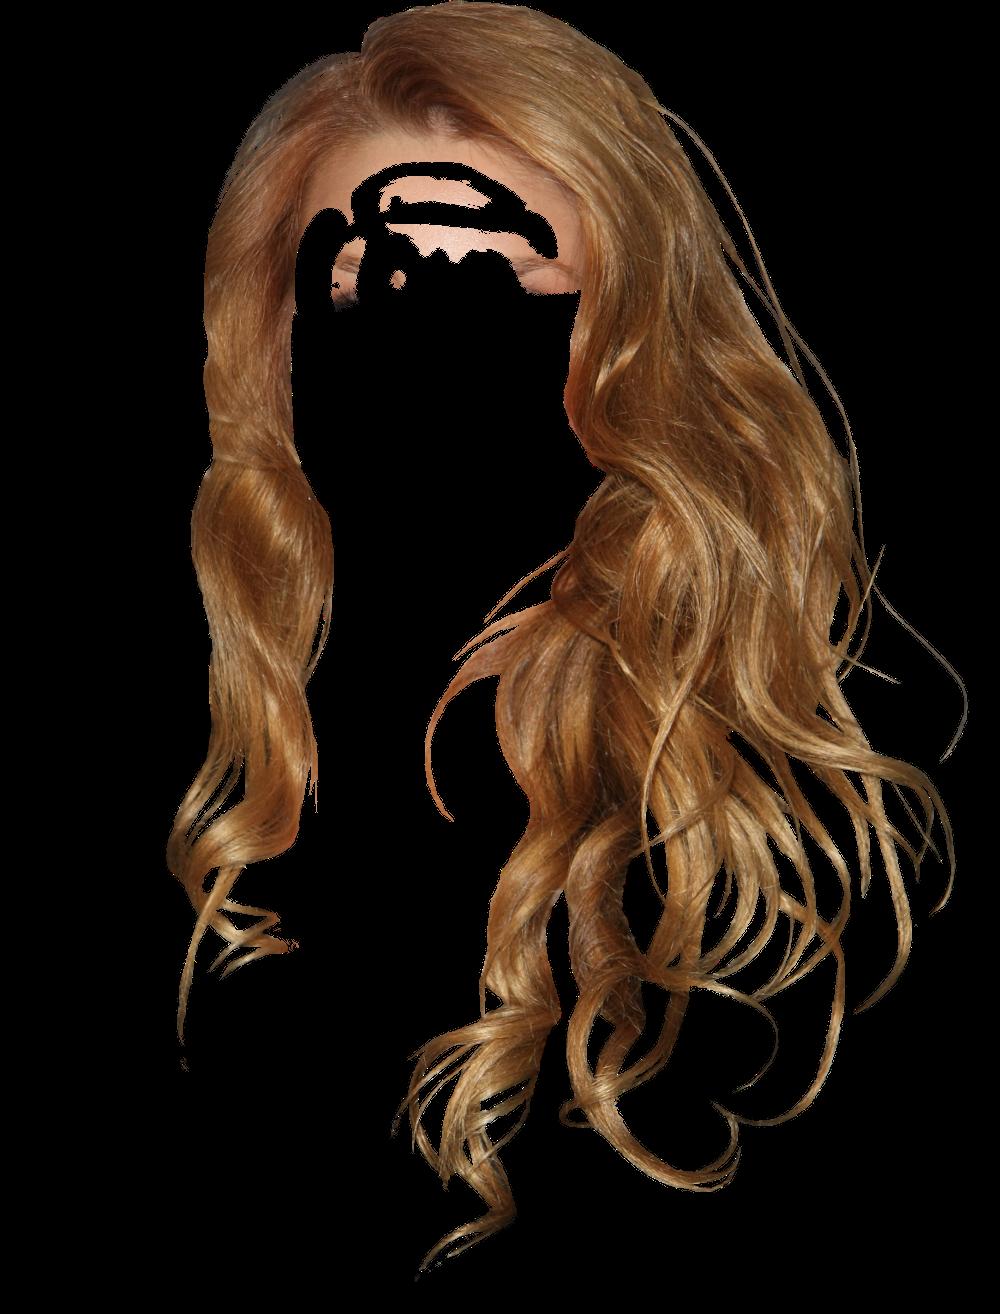 Картинка локон волос